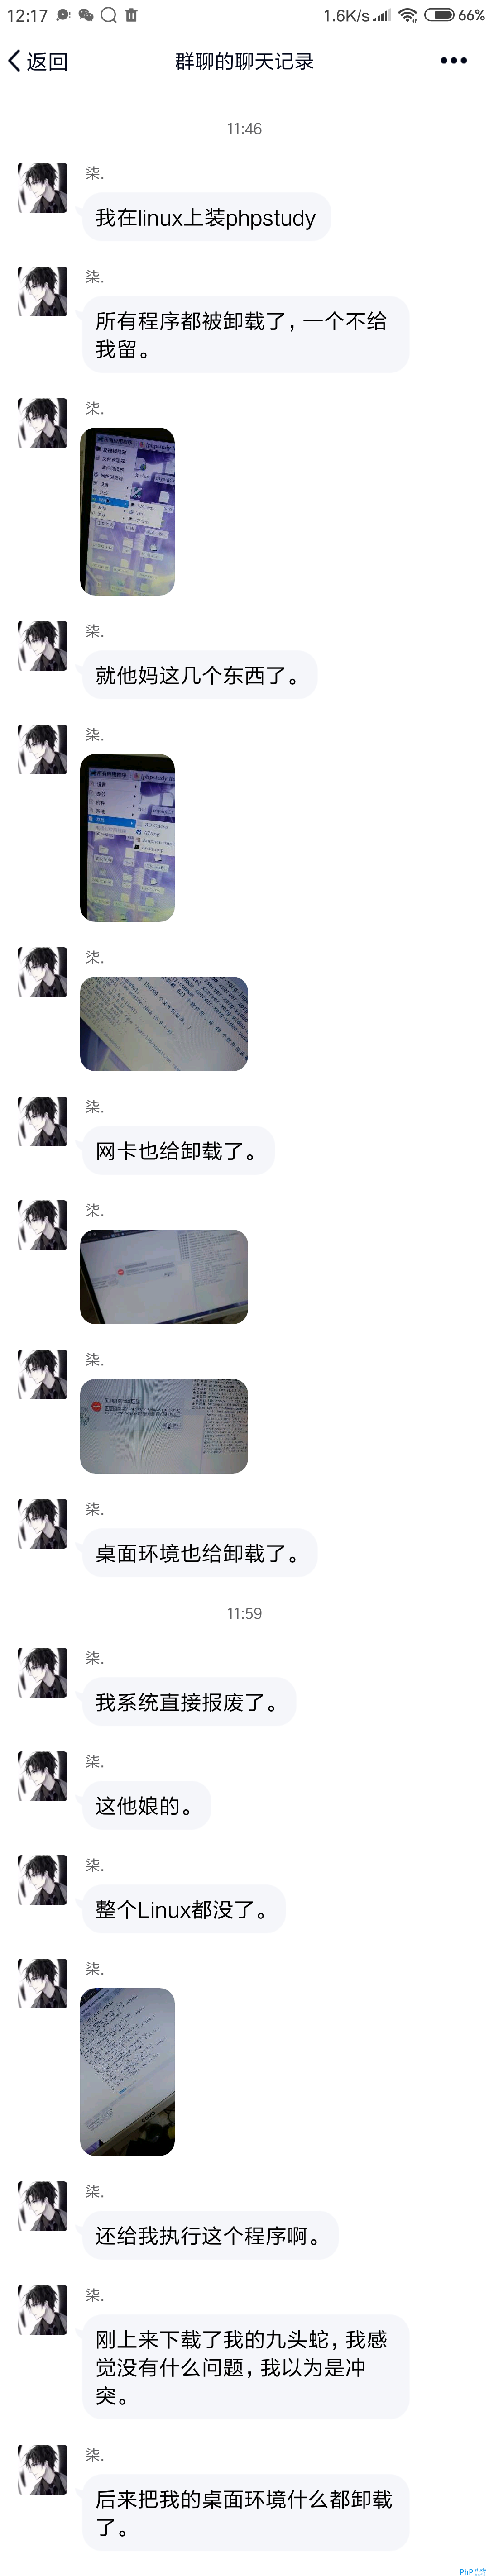 Screenshot_2019-10-05-12-17-08-960_com.tencent.mo.png